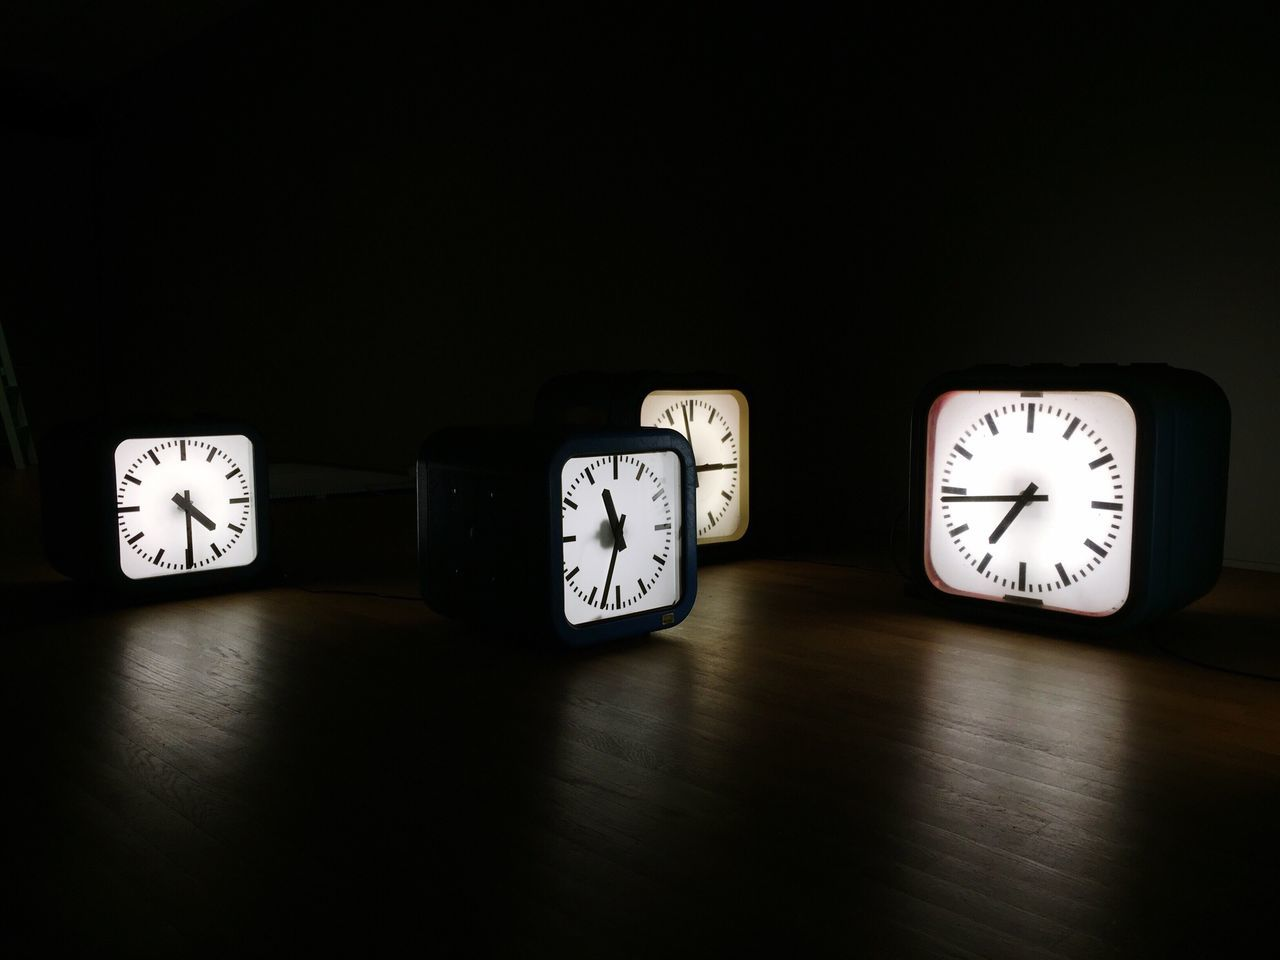 Illuminated Clock On Table Against Black Background